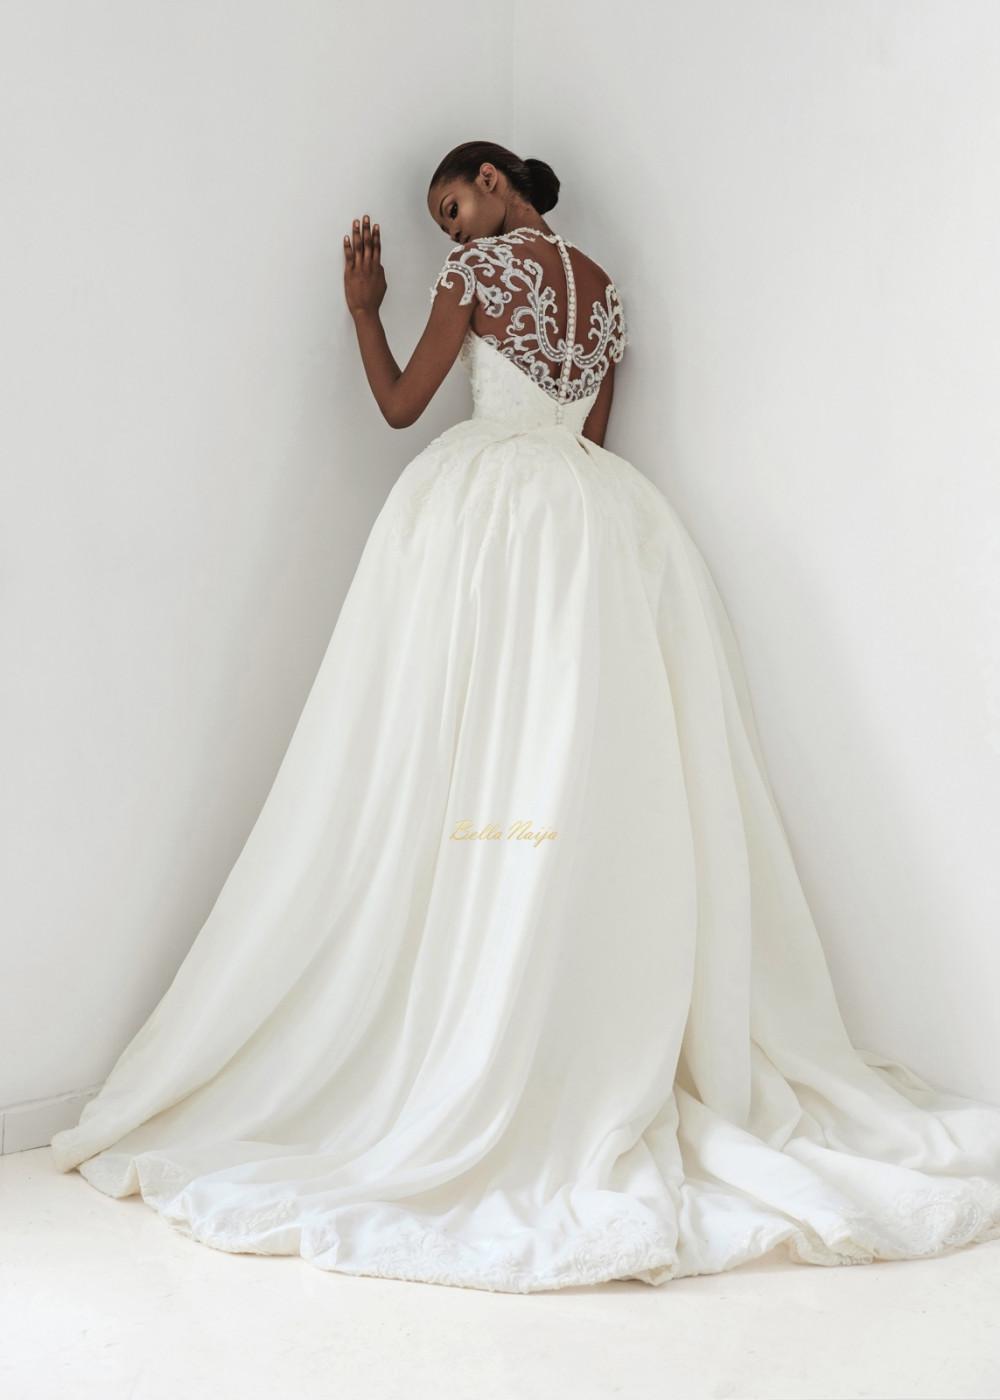 Wedding Dress Steamer 27 Good The Andrea Iyamah bridal